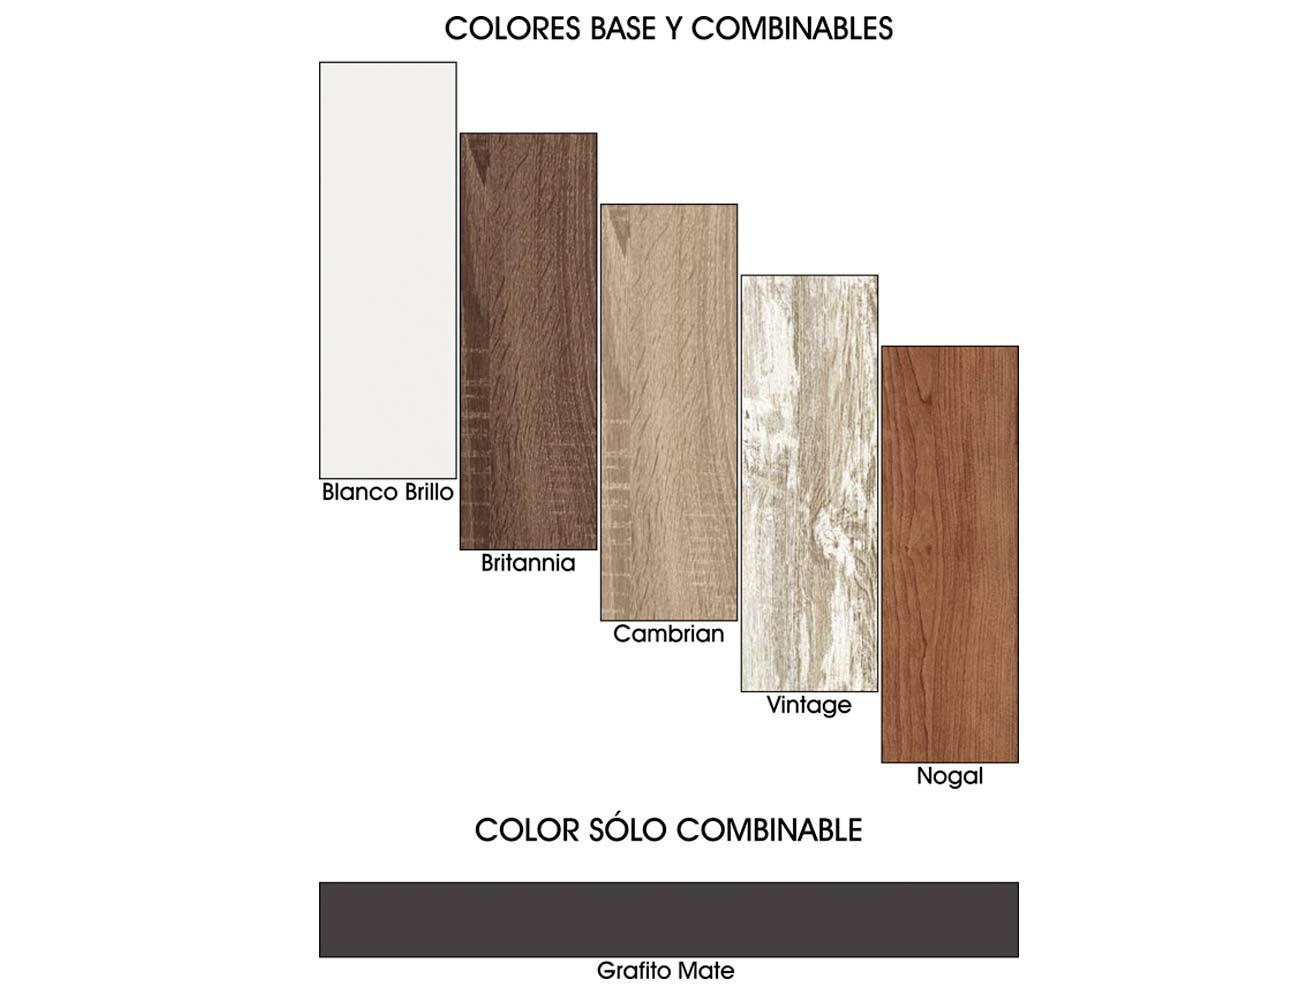 Colores11